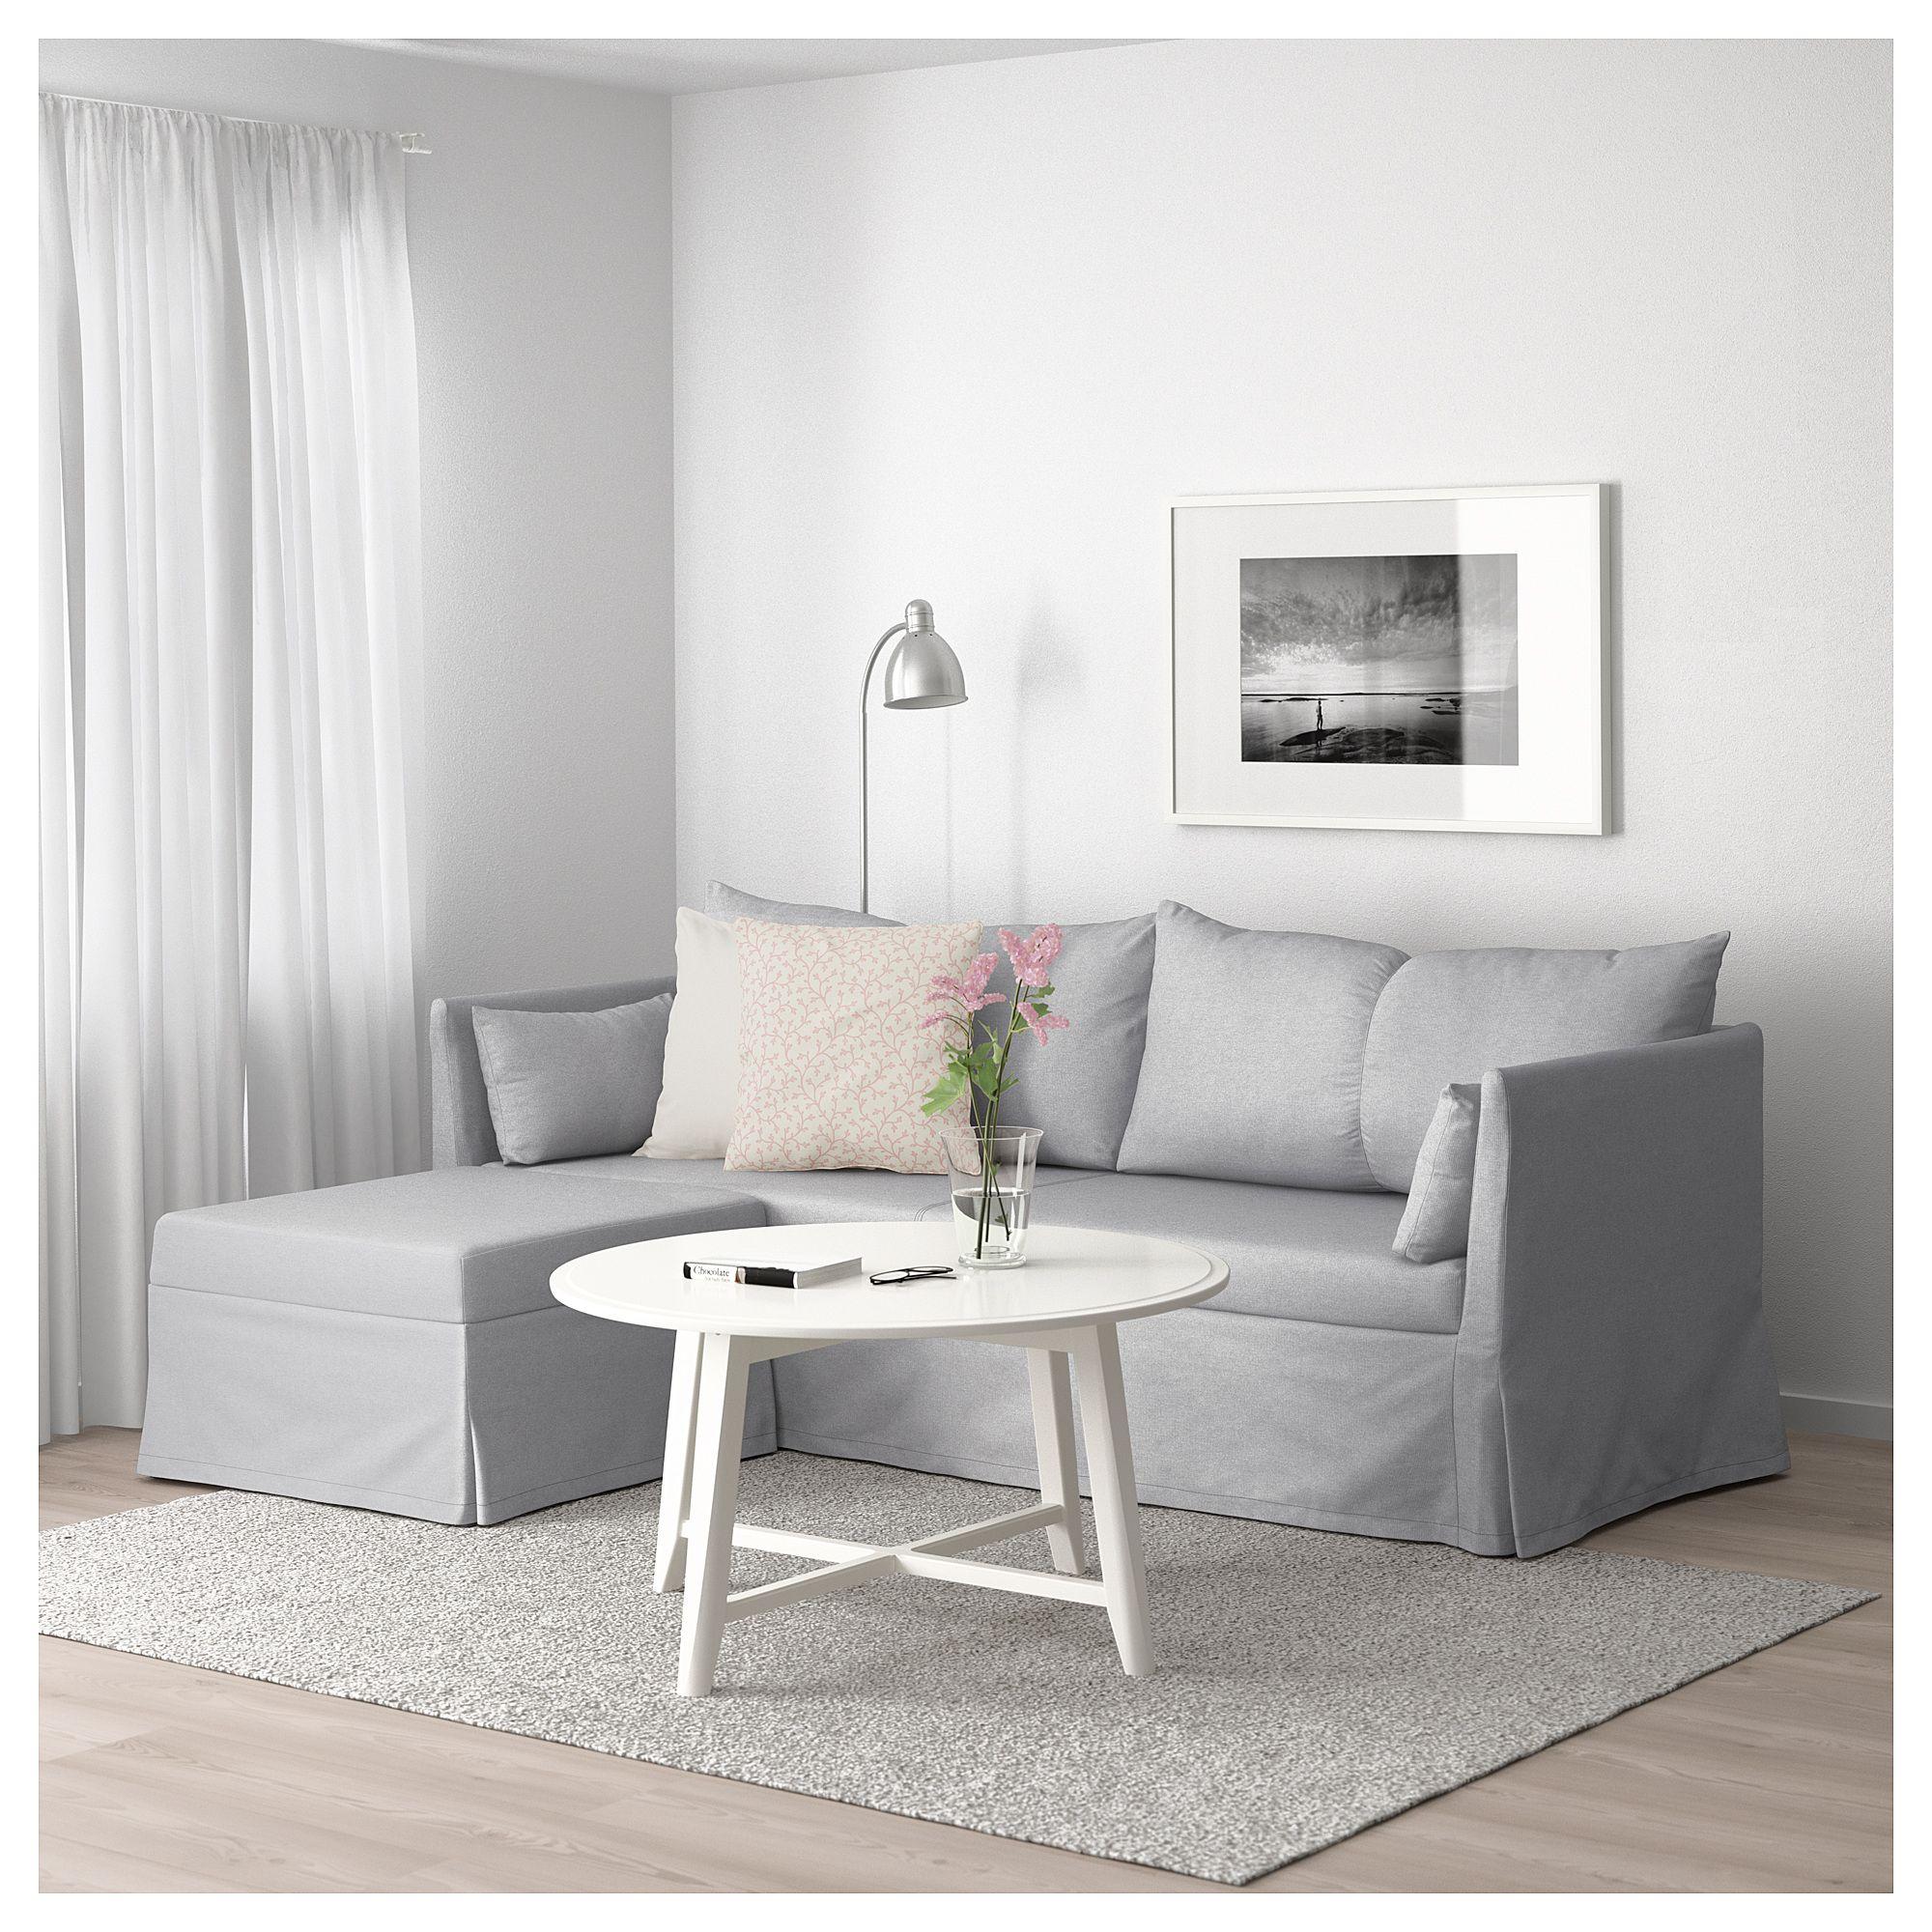 Furniture Home Furnishings Find Your Inspiration Small Living Room Decor Corner Sofa Bed Corner Sofa [ 2000 x 2000 Pixel ]